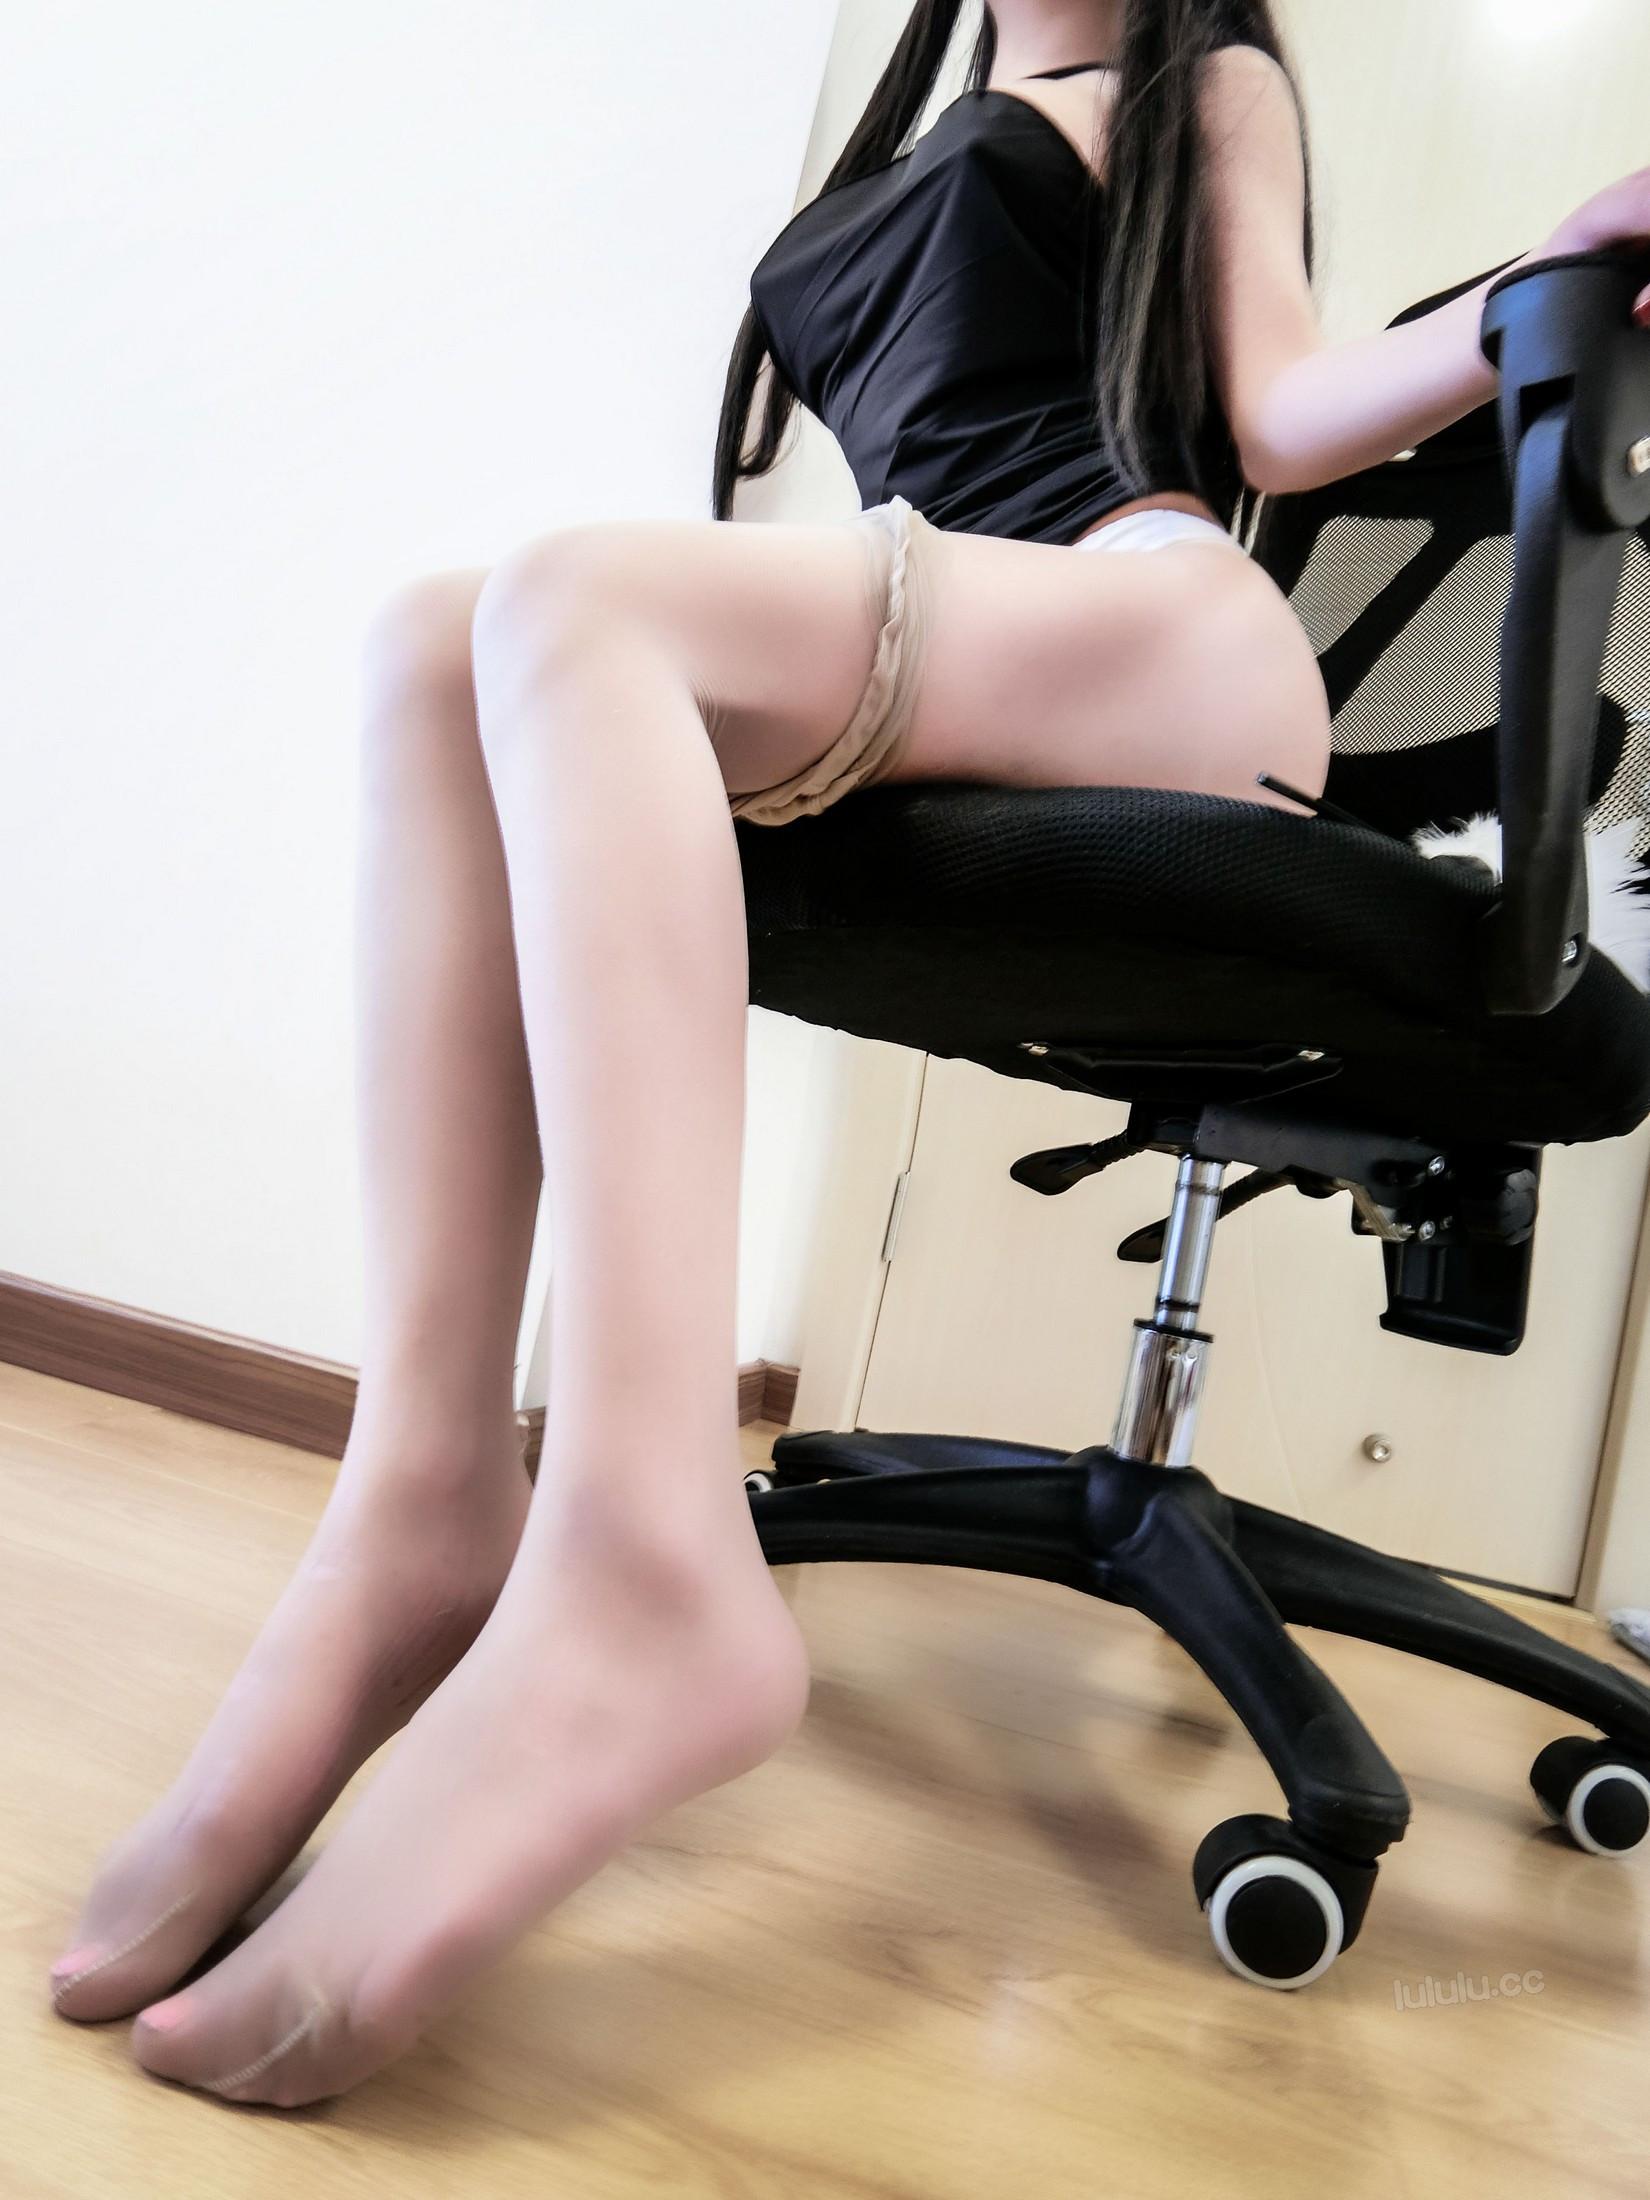 [cosplay] MaSusu - Sexy black skirt cleaning 019